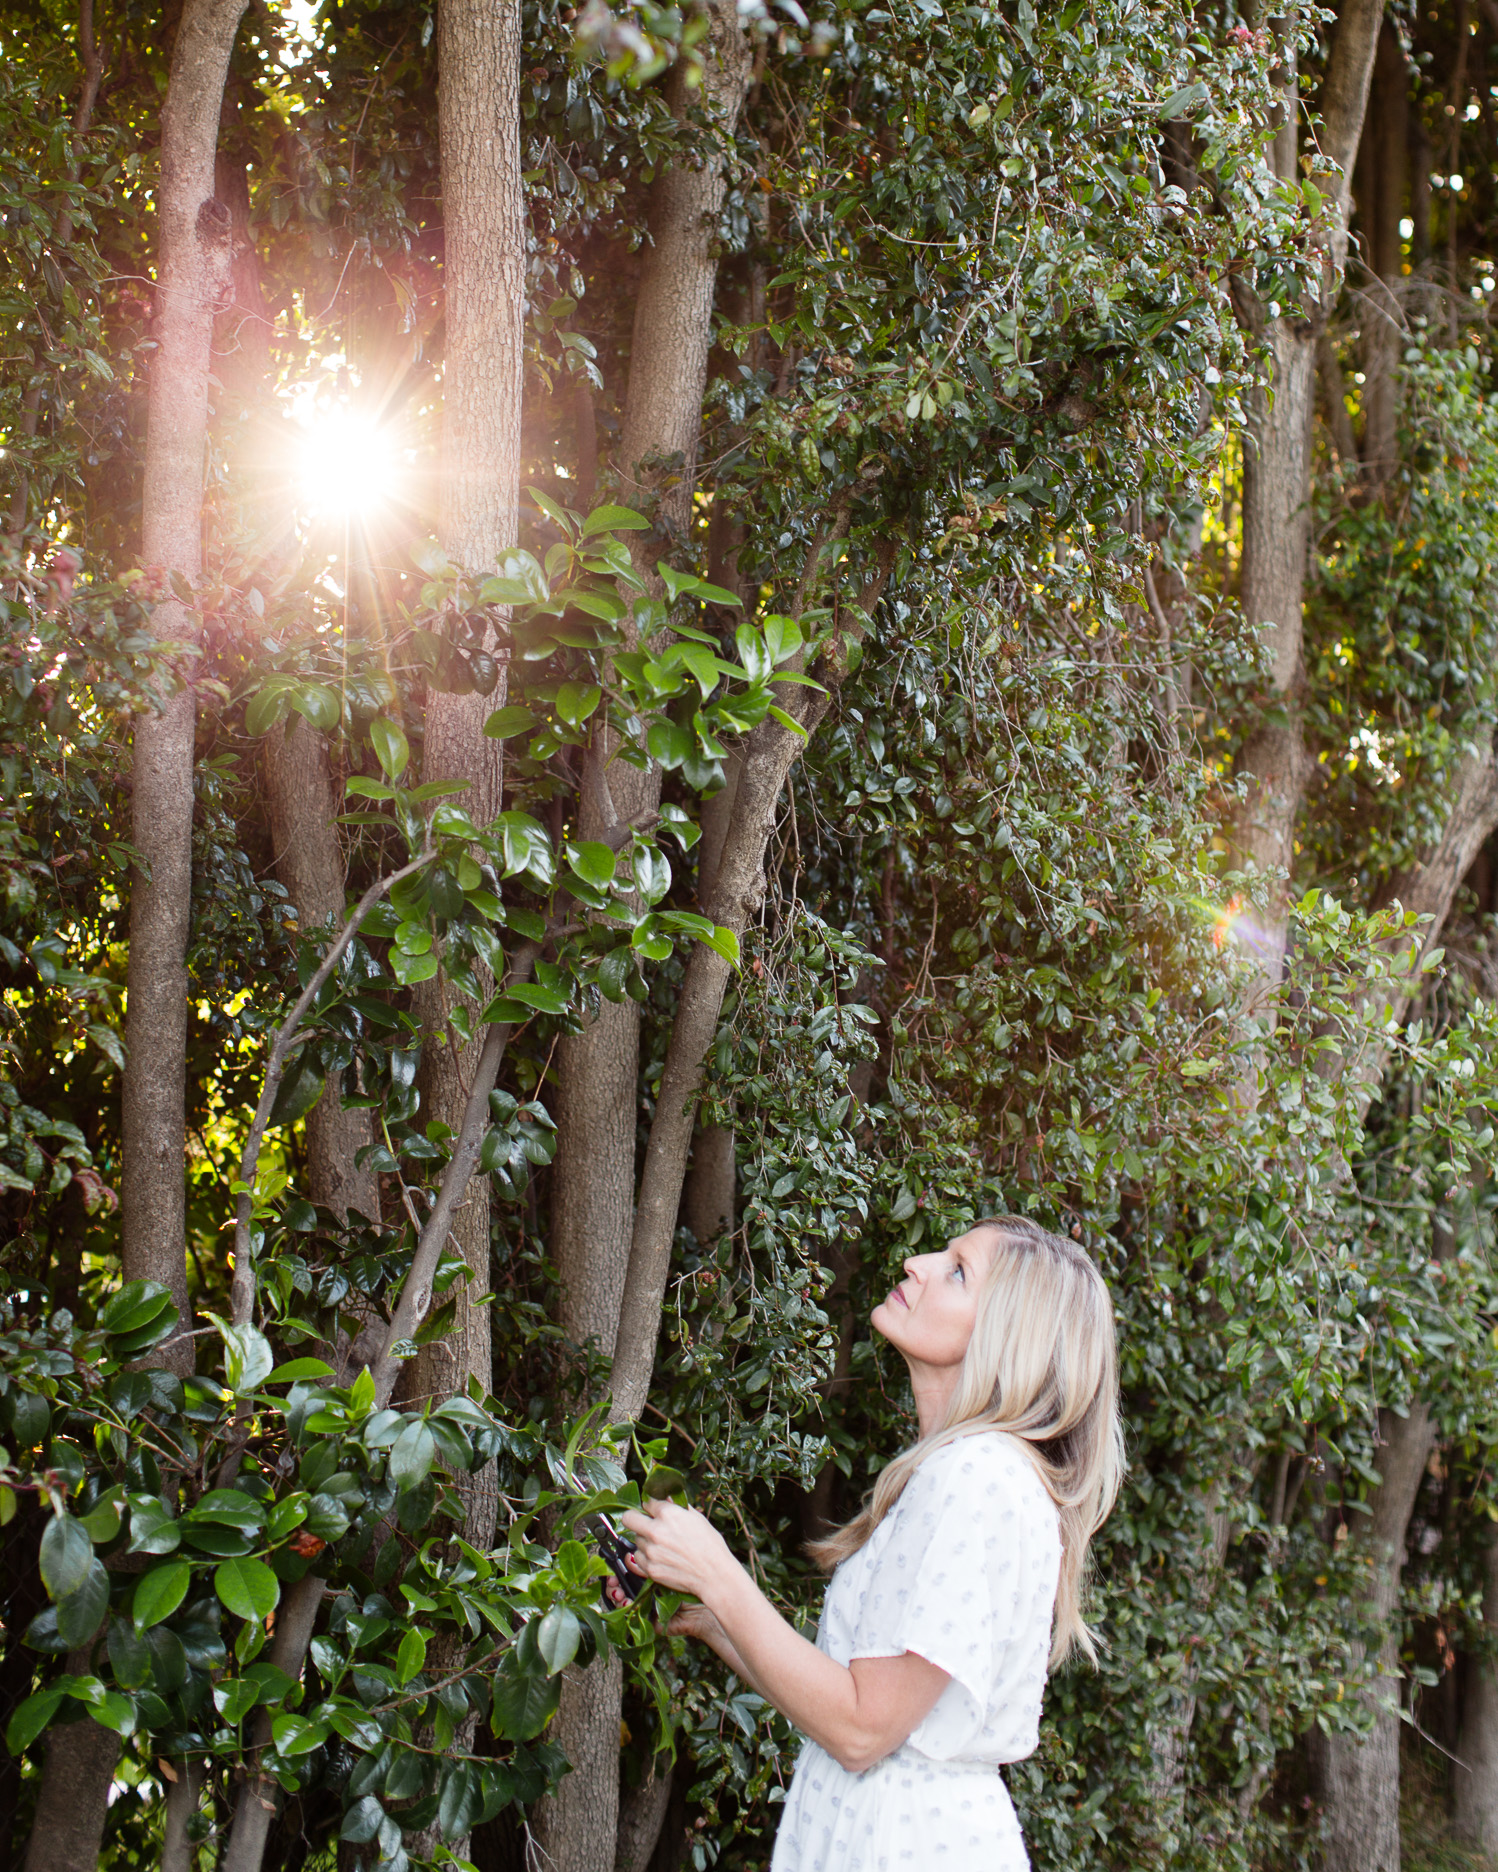 hylah-hedgepeth-photography-D73A9878-Edit.jpg